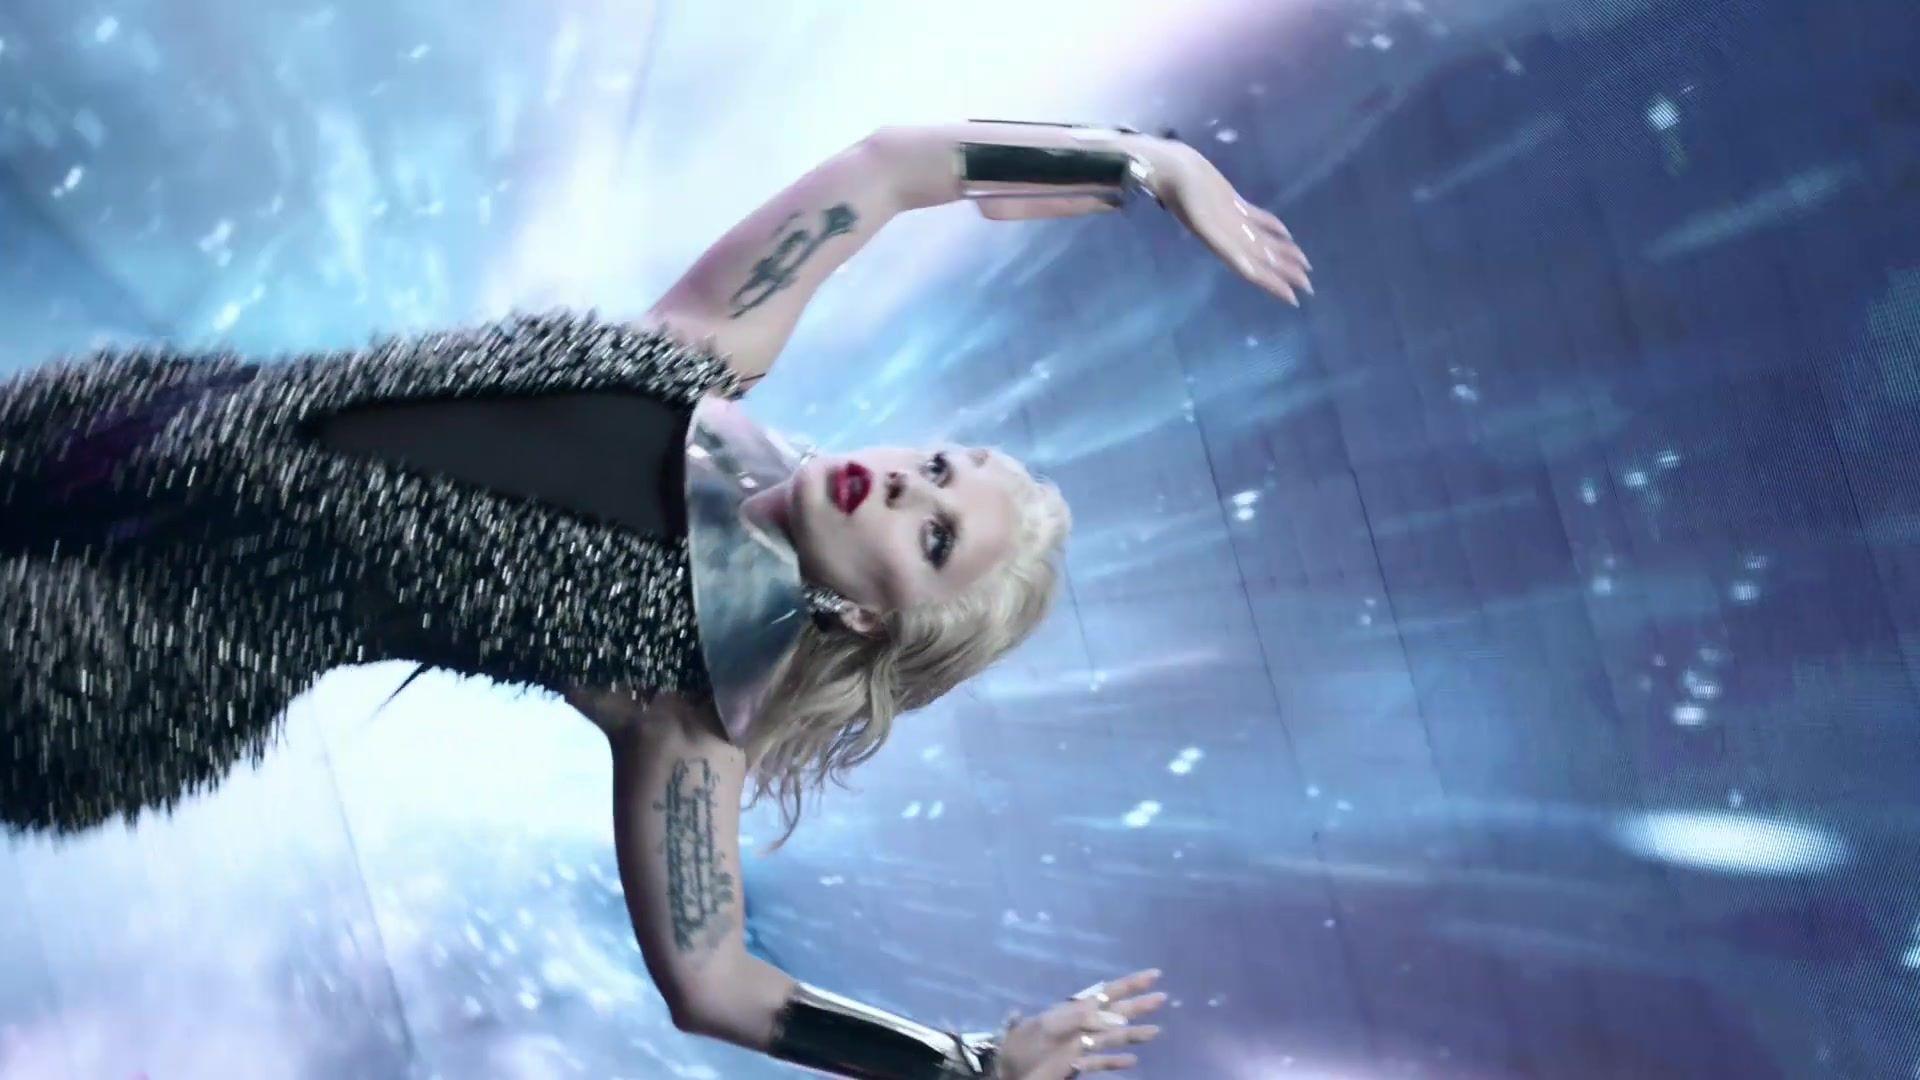 2015-Dec-Intel-x-Gaga-5.jpg